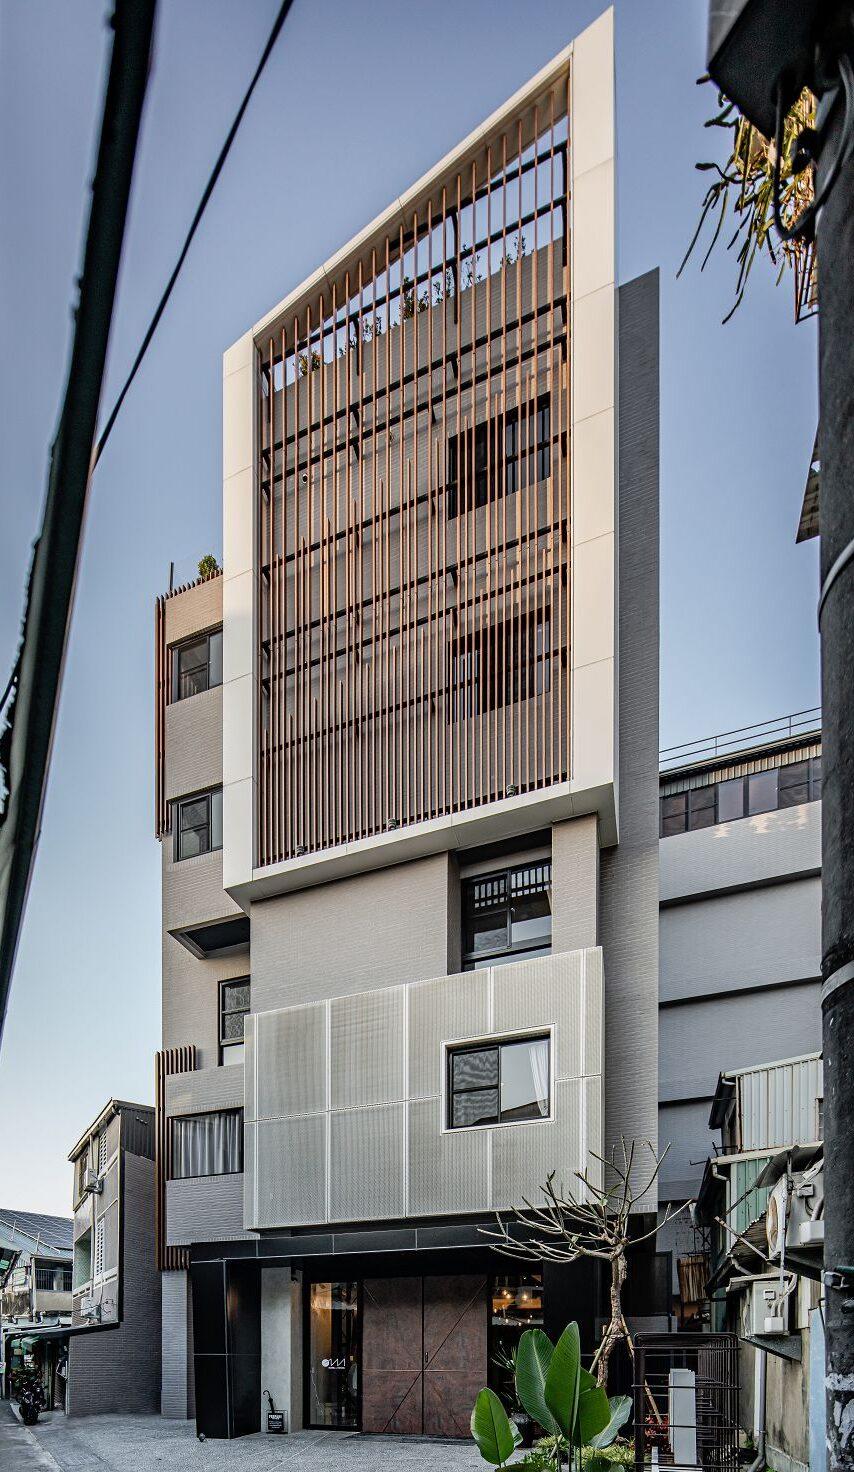 Oinn Hotel & Hostel